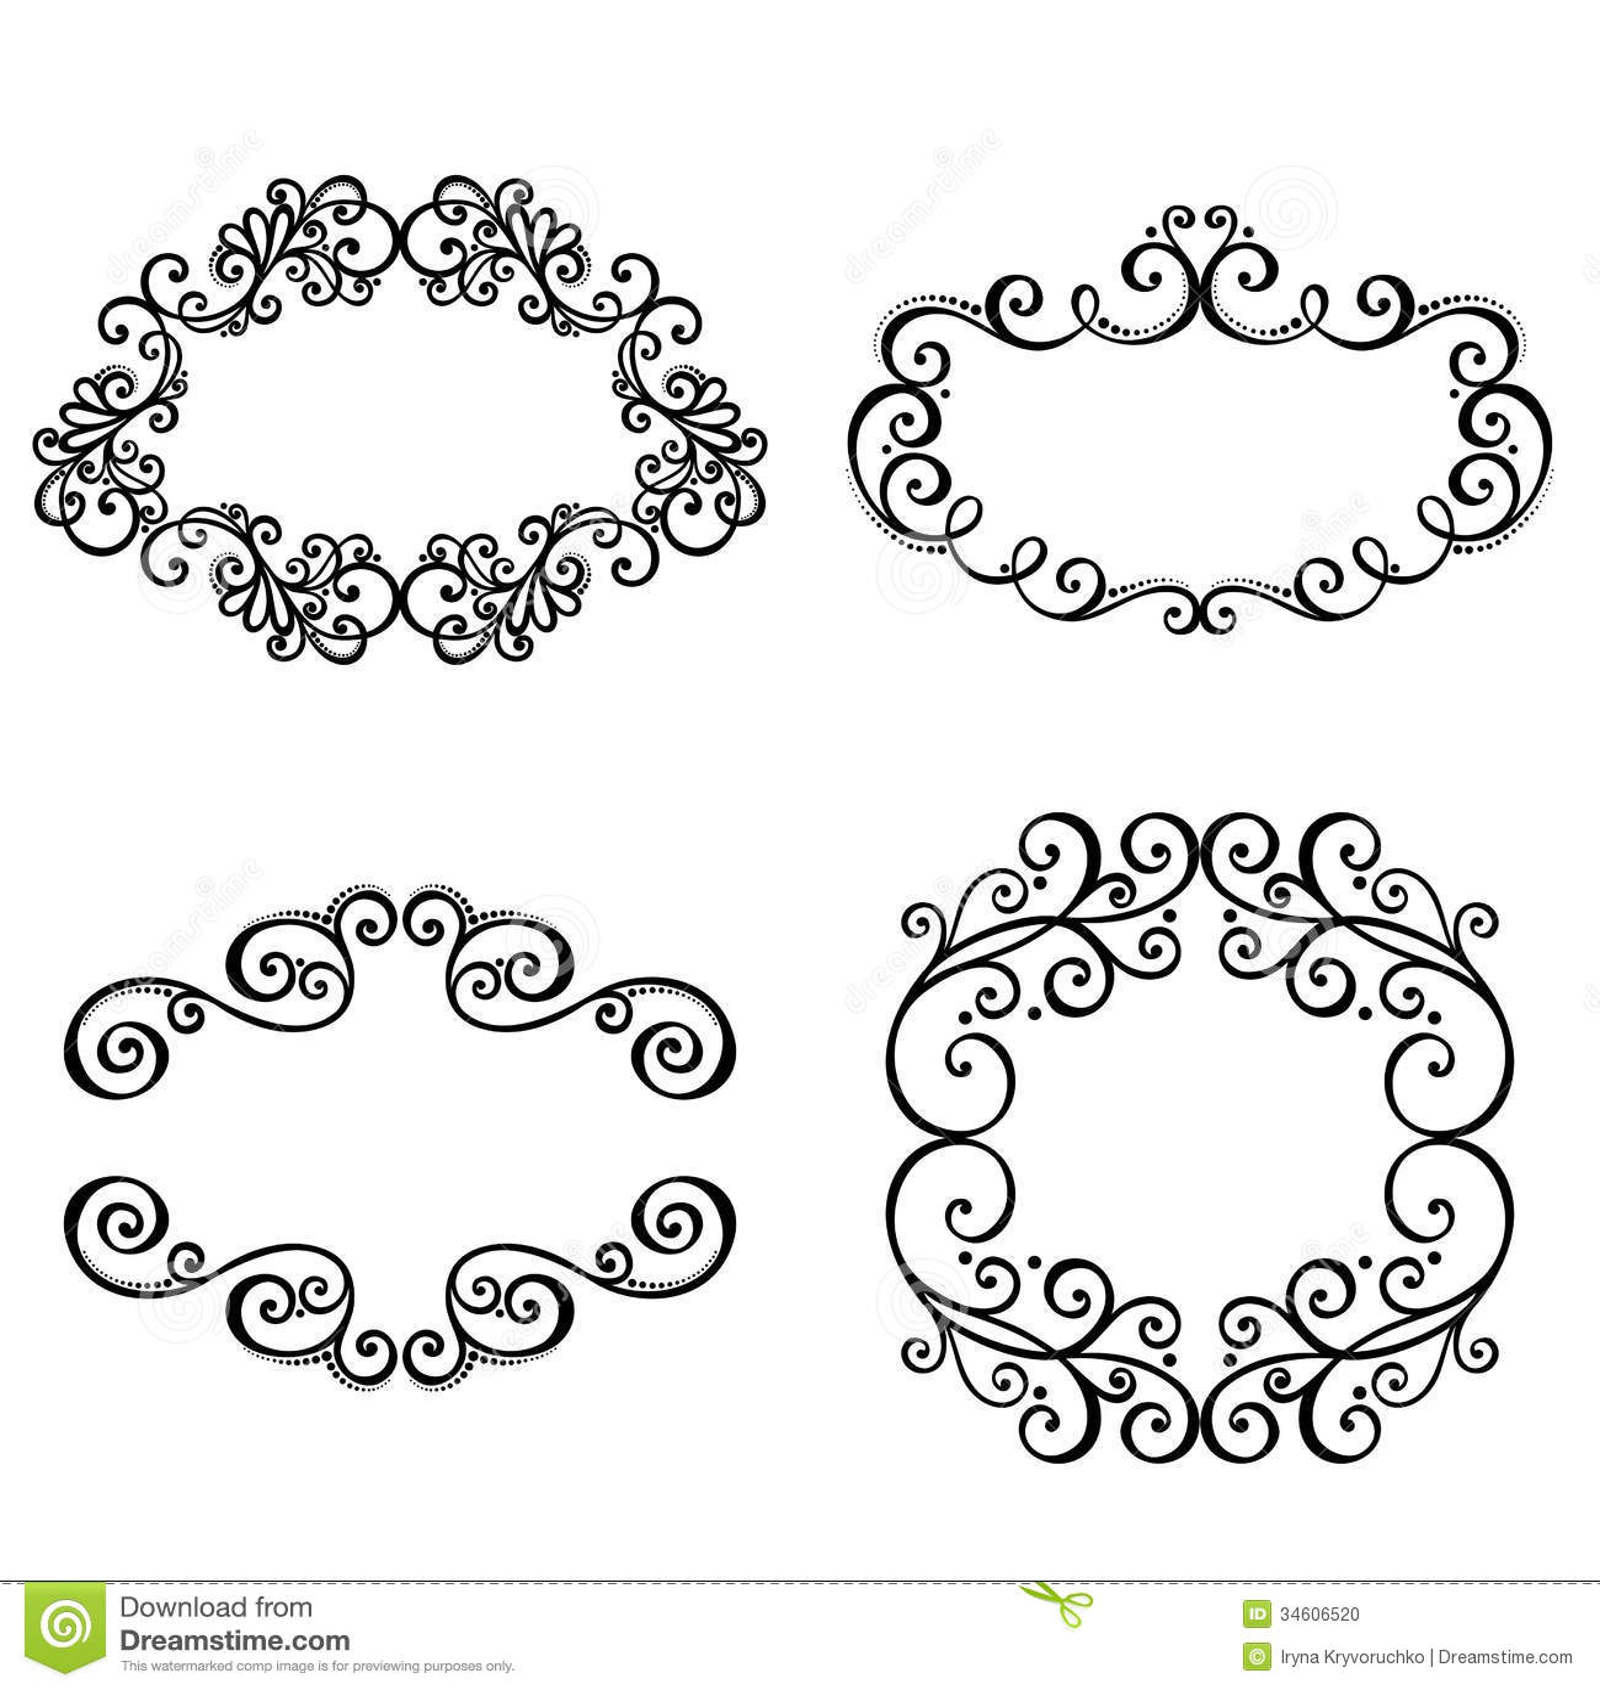 Dekorativer Ornamentrahmen Für Text. Vektor Abbildung - Illustration ...